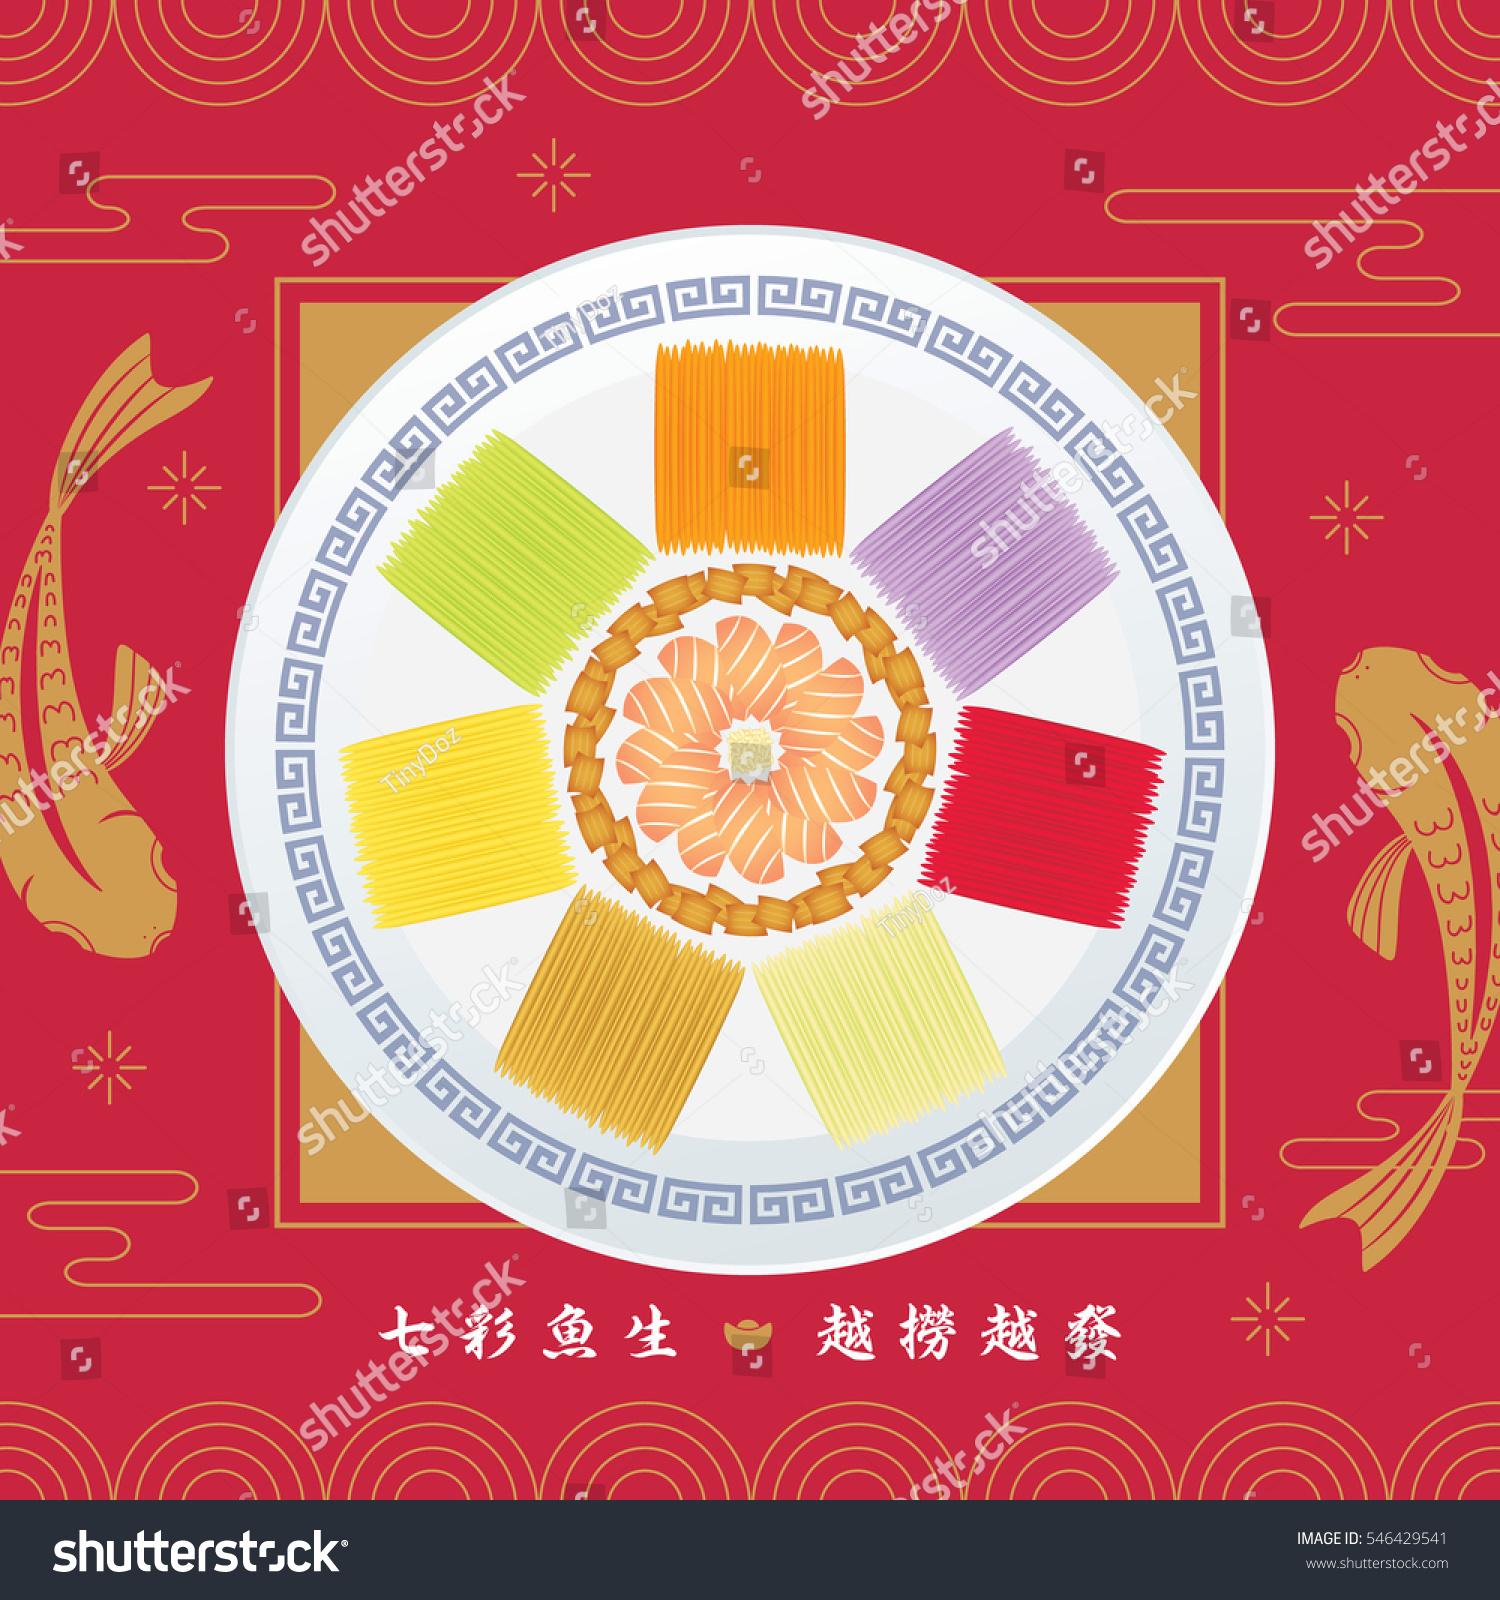 Yu sheng lou sang appetizer eating stock vector 546429541 yu sheng or lou sang is a appetizer eating during chinese new year symbolism of buycottarizona